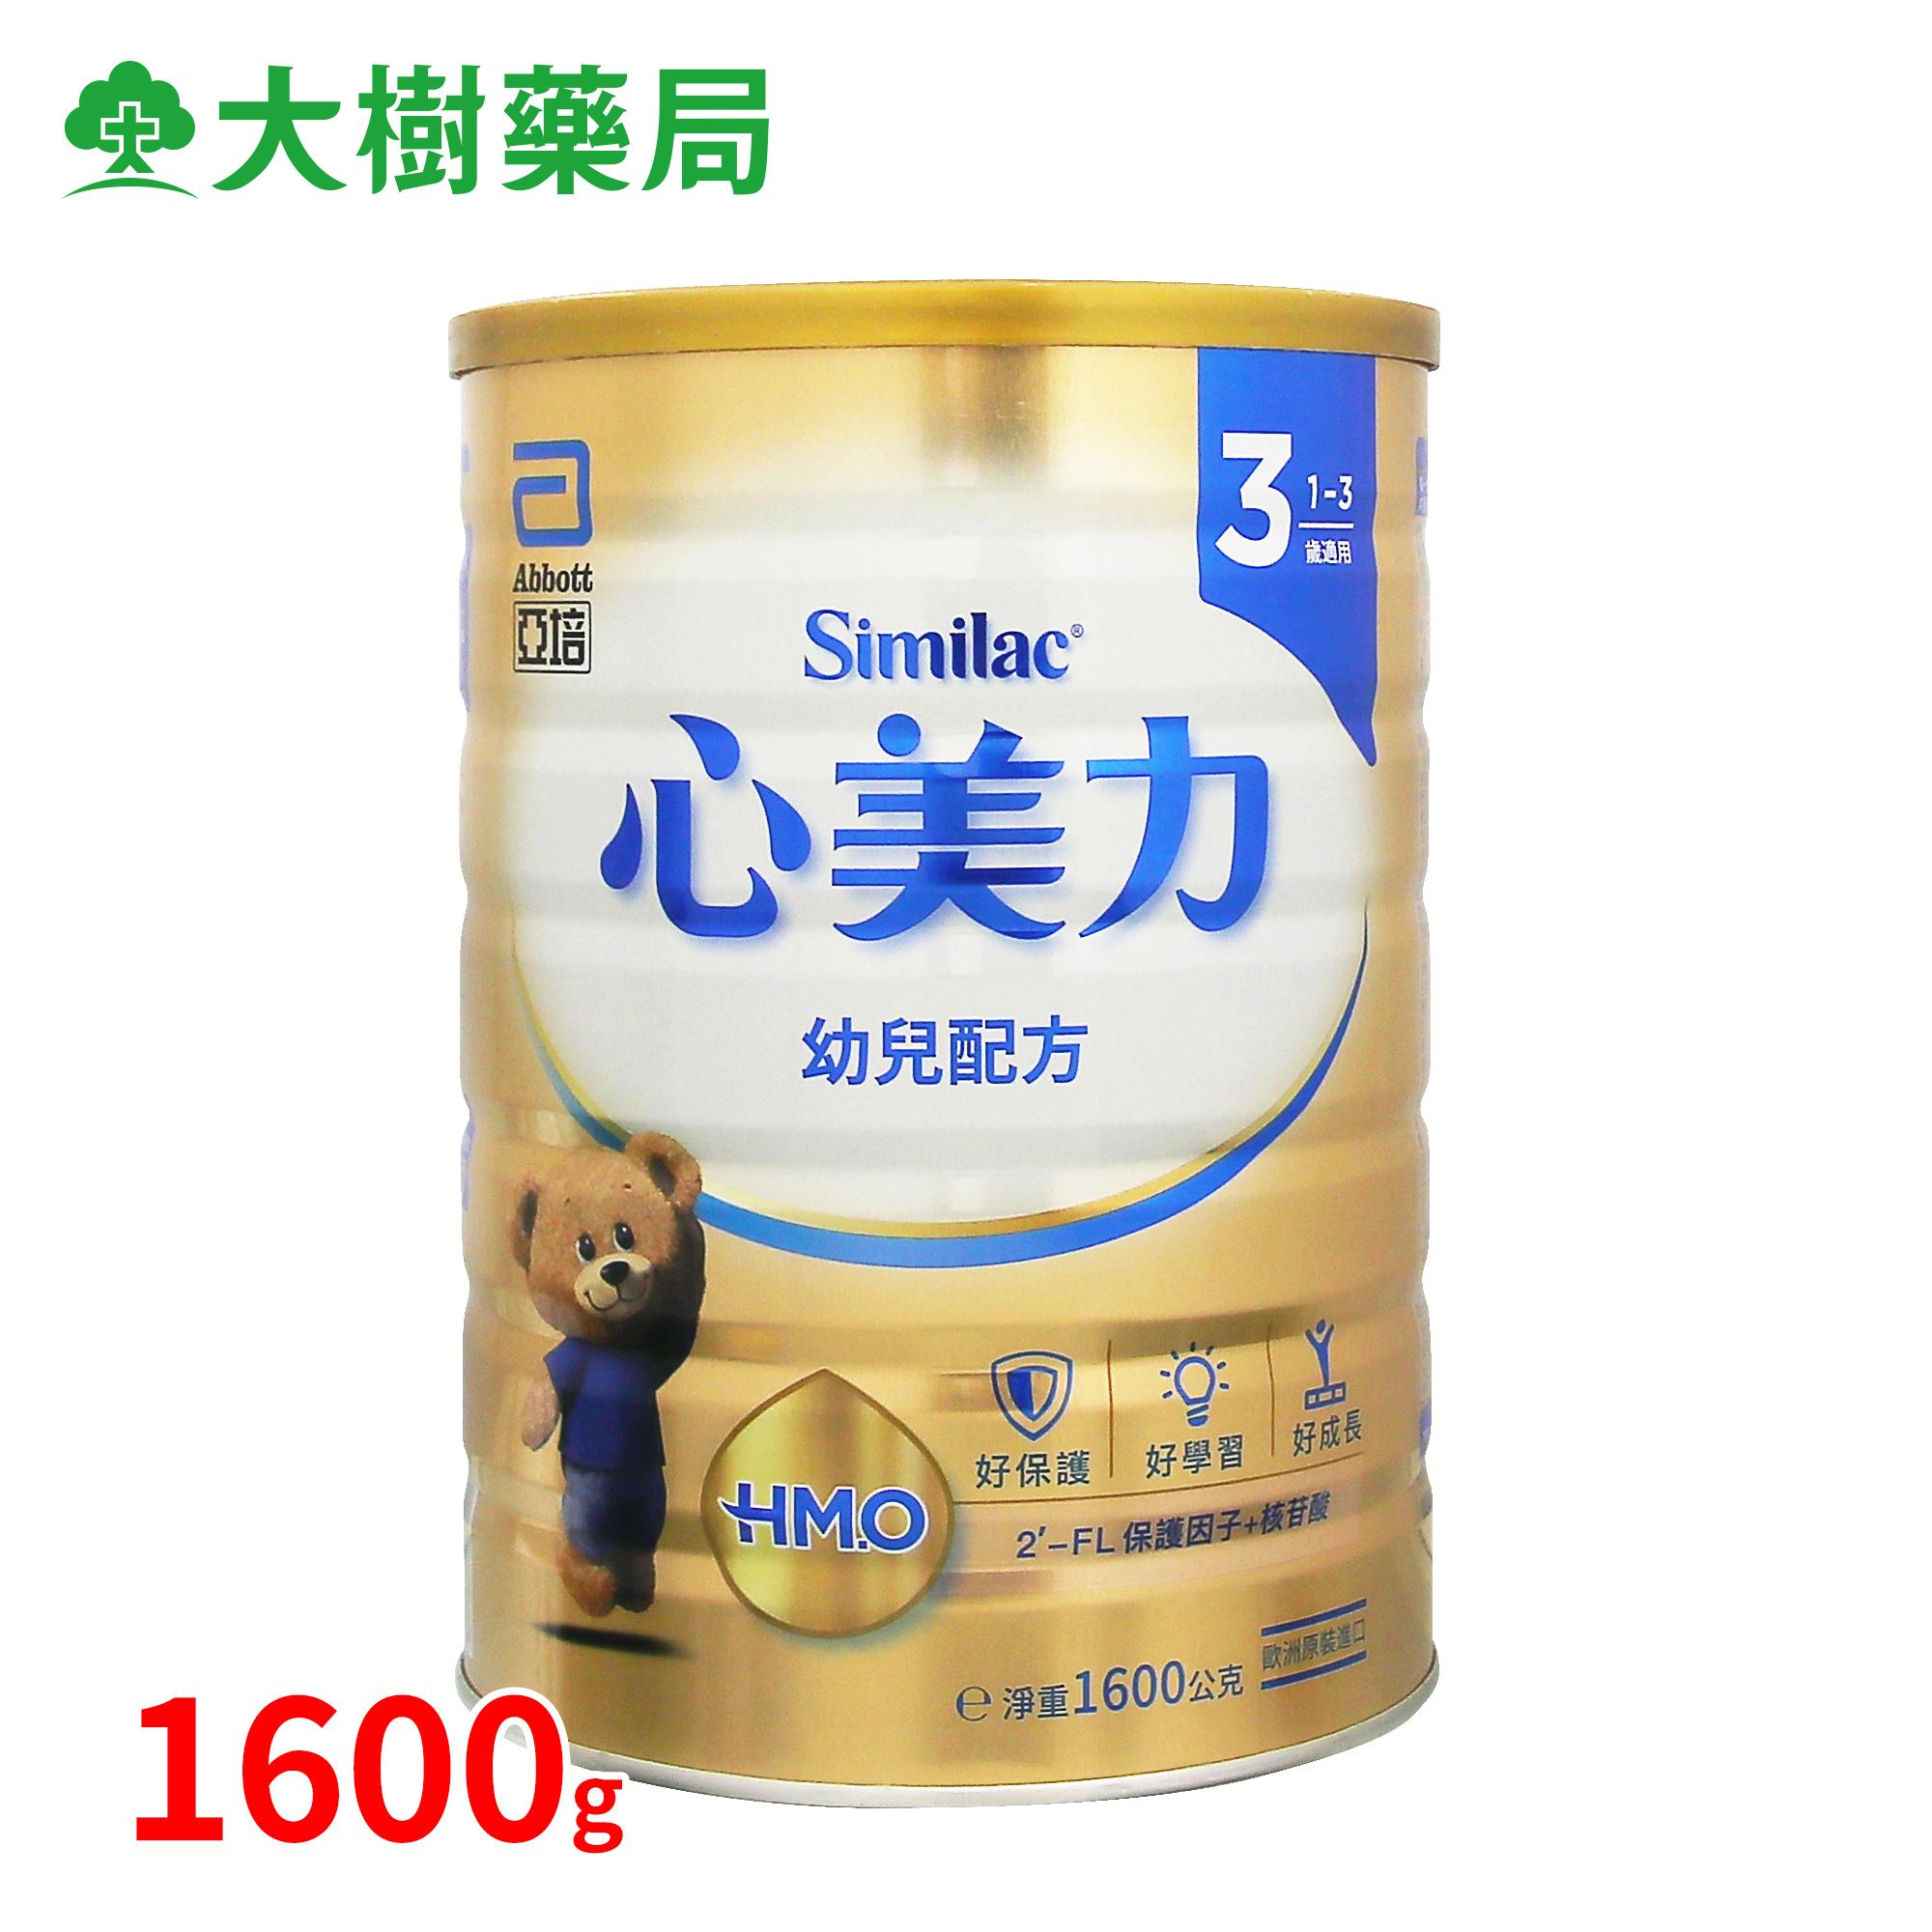 Abbott xinmeili 3-stage milk powder 1700g Irish infant milk powder 3-stage large can